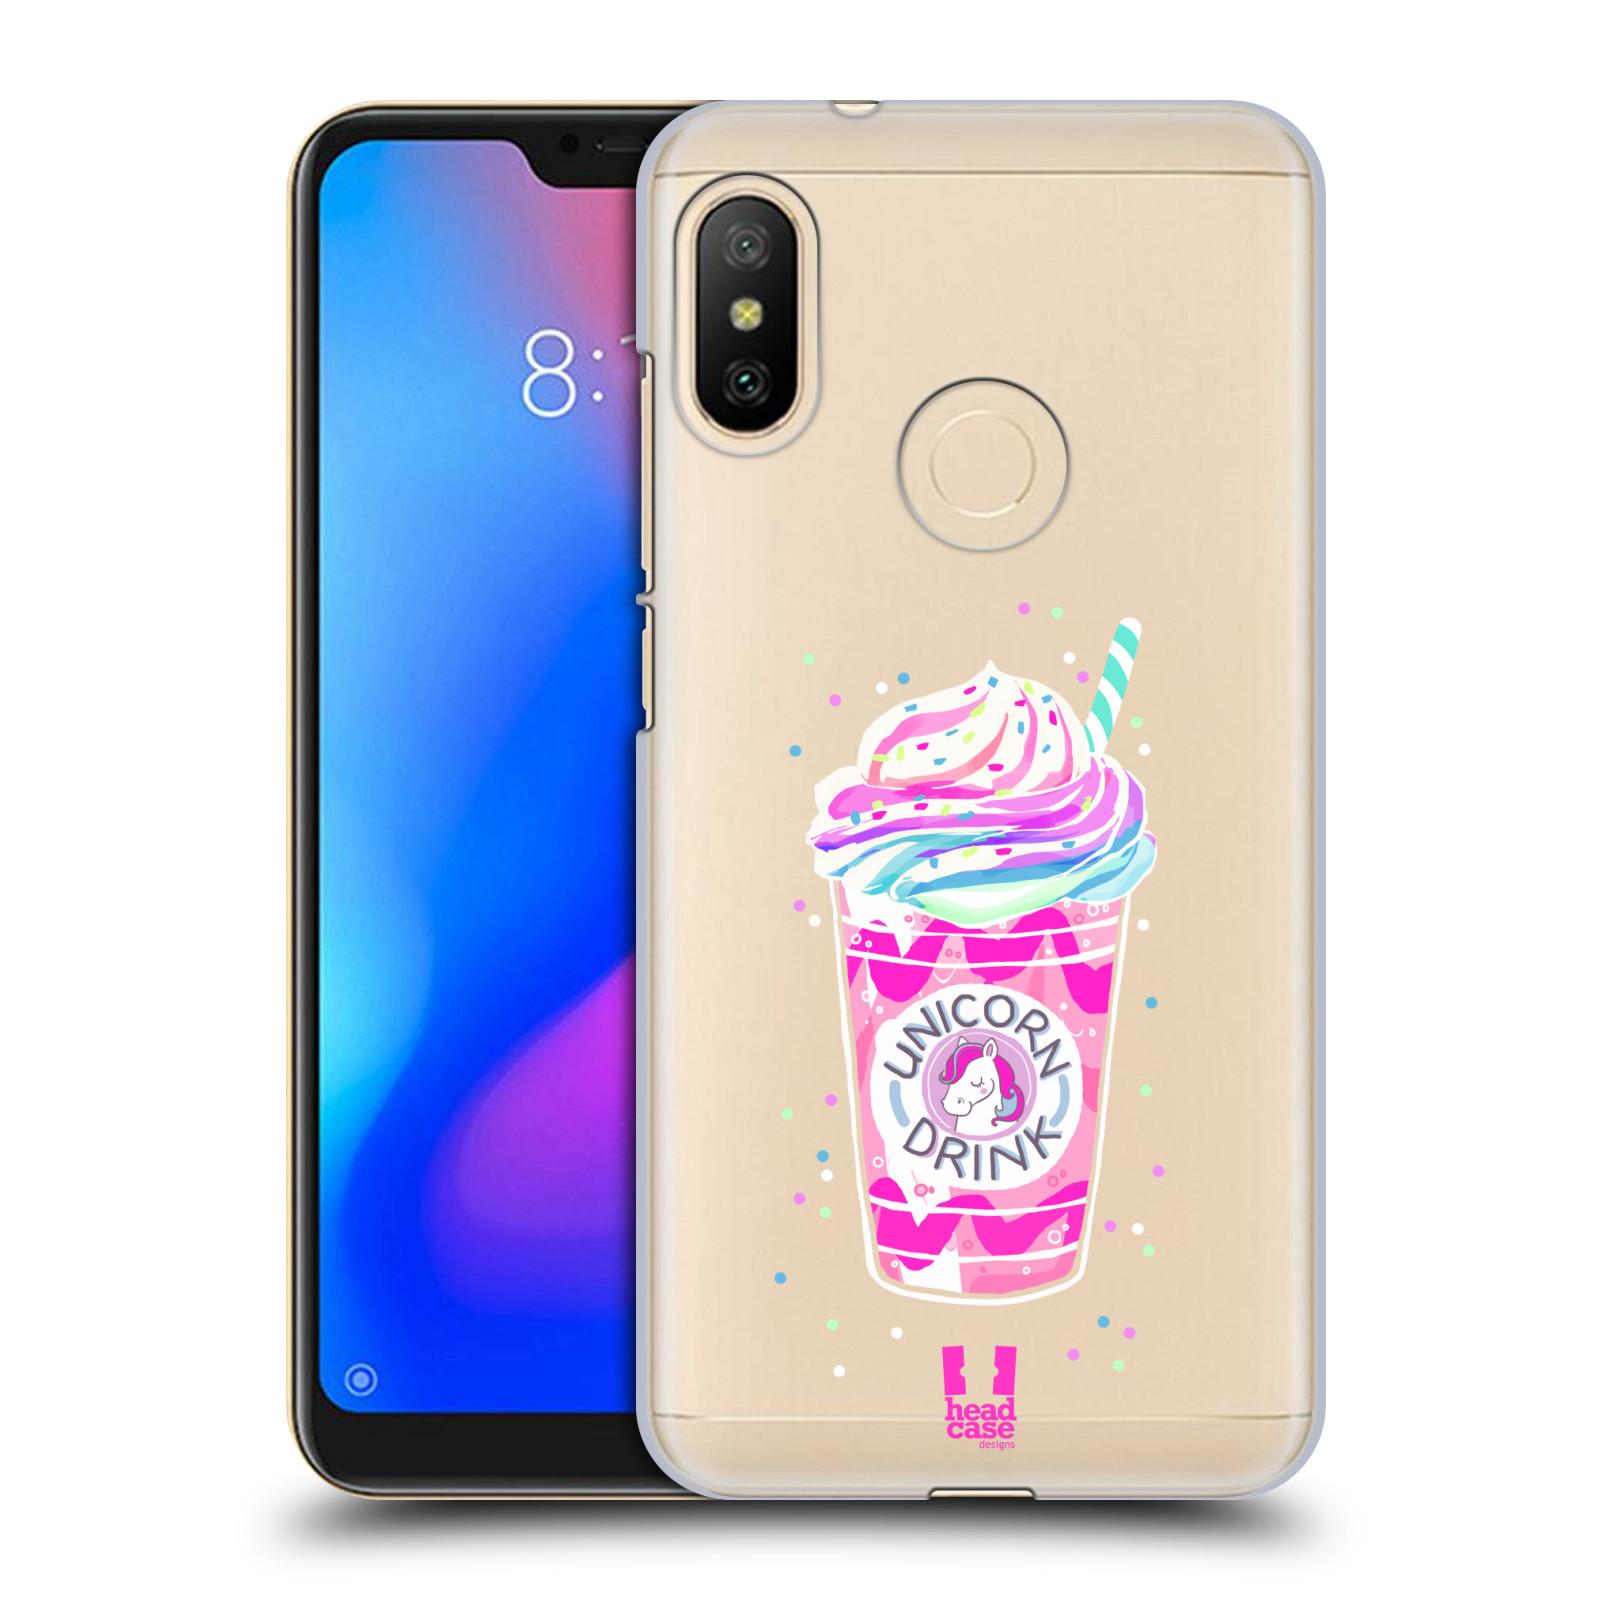 Plastové pouzdro na mobil Xiaomi Mi A2 Lite - Head Case - Unicorn drink